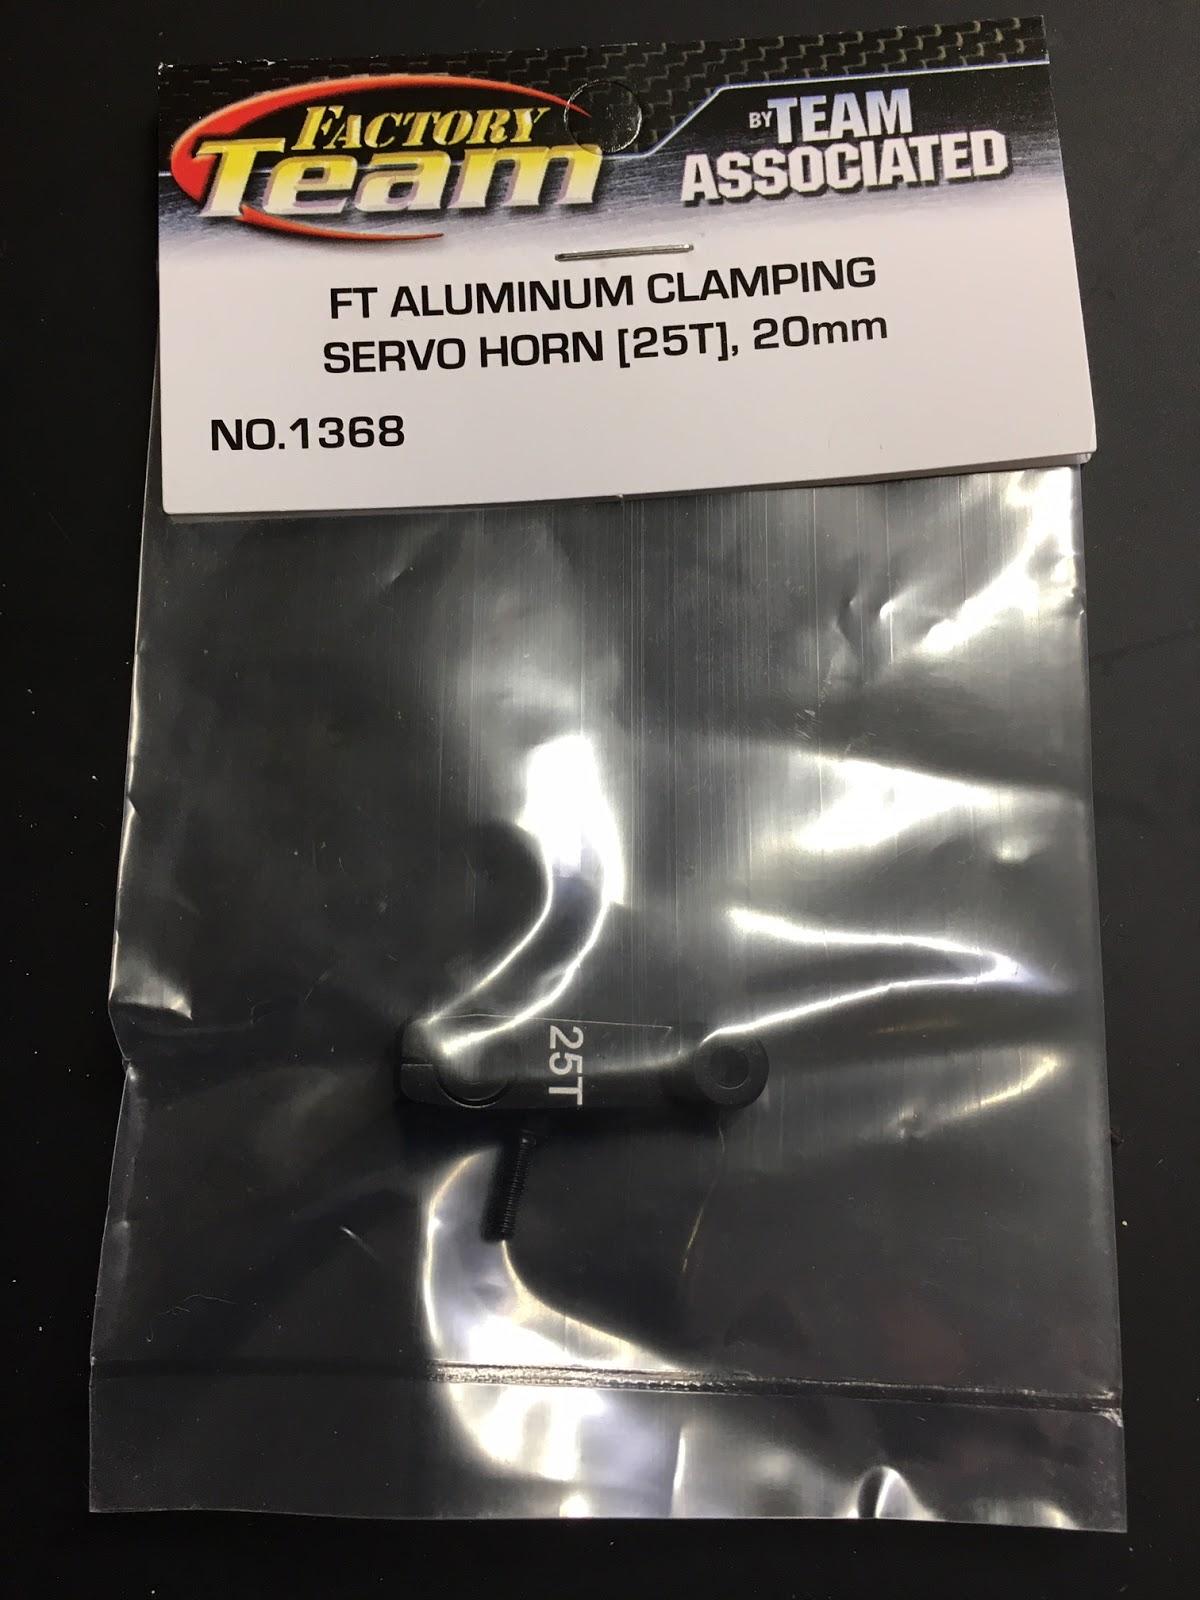 Associated 1368 FT Aluminum Clamping Servo Horn 25T 20 mm